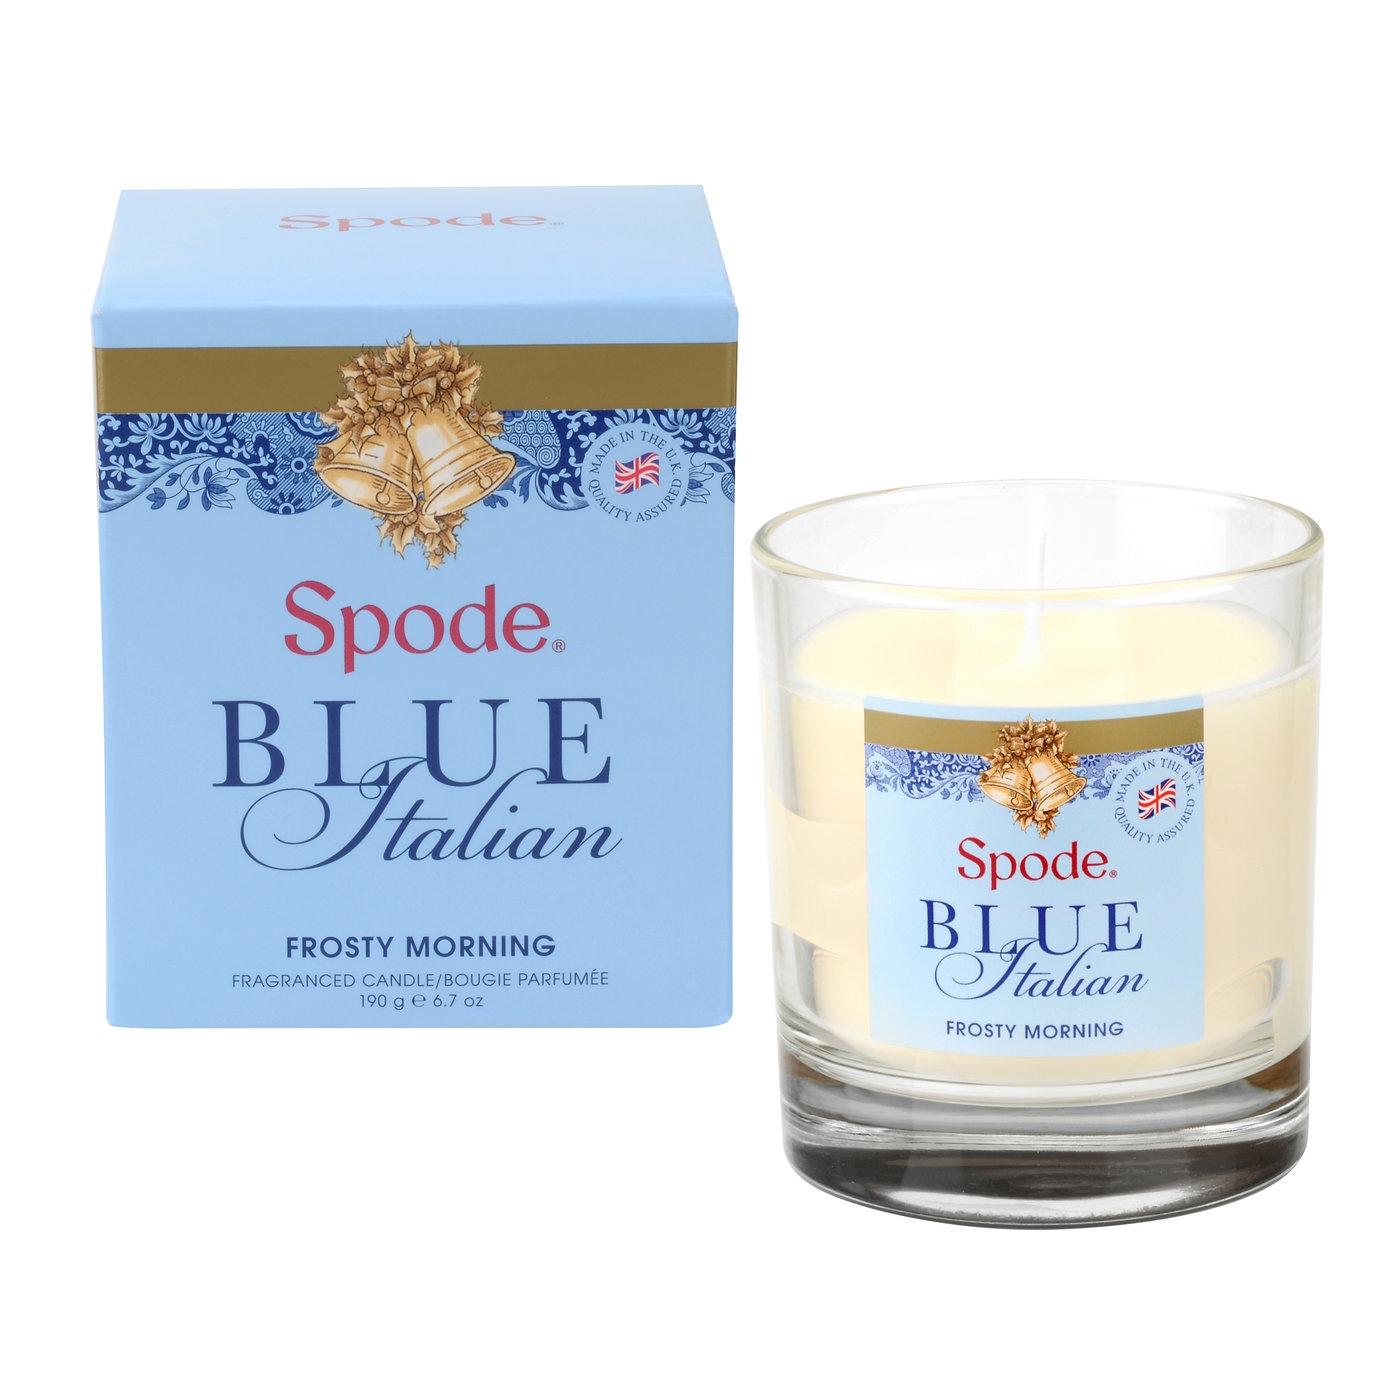 Blue Italian Fragrance Collection